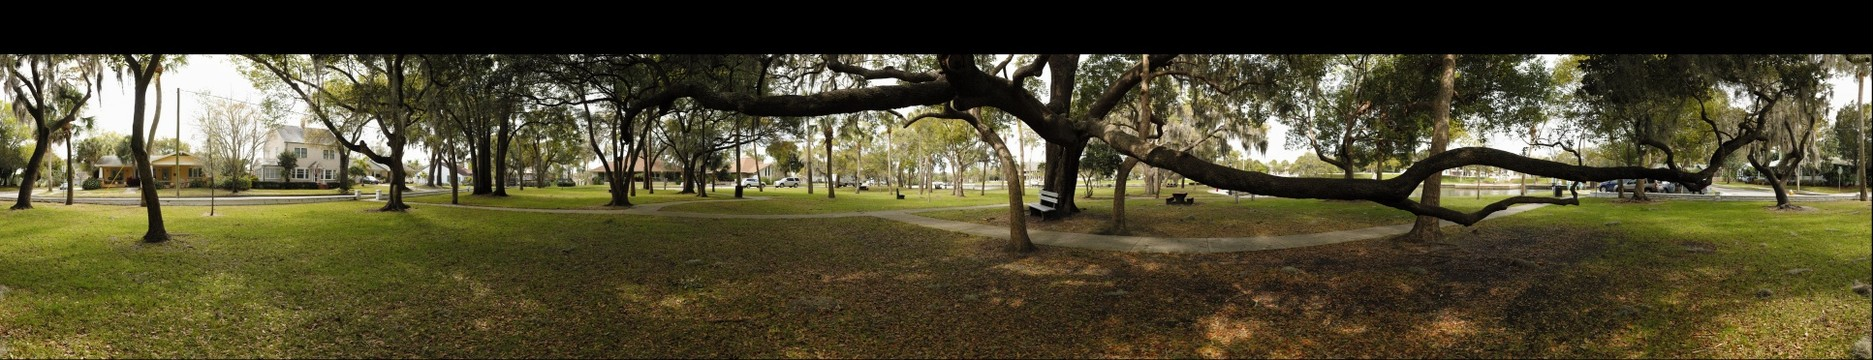 Live Oak at Craig Park - Stereo 3D